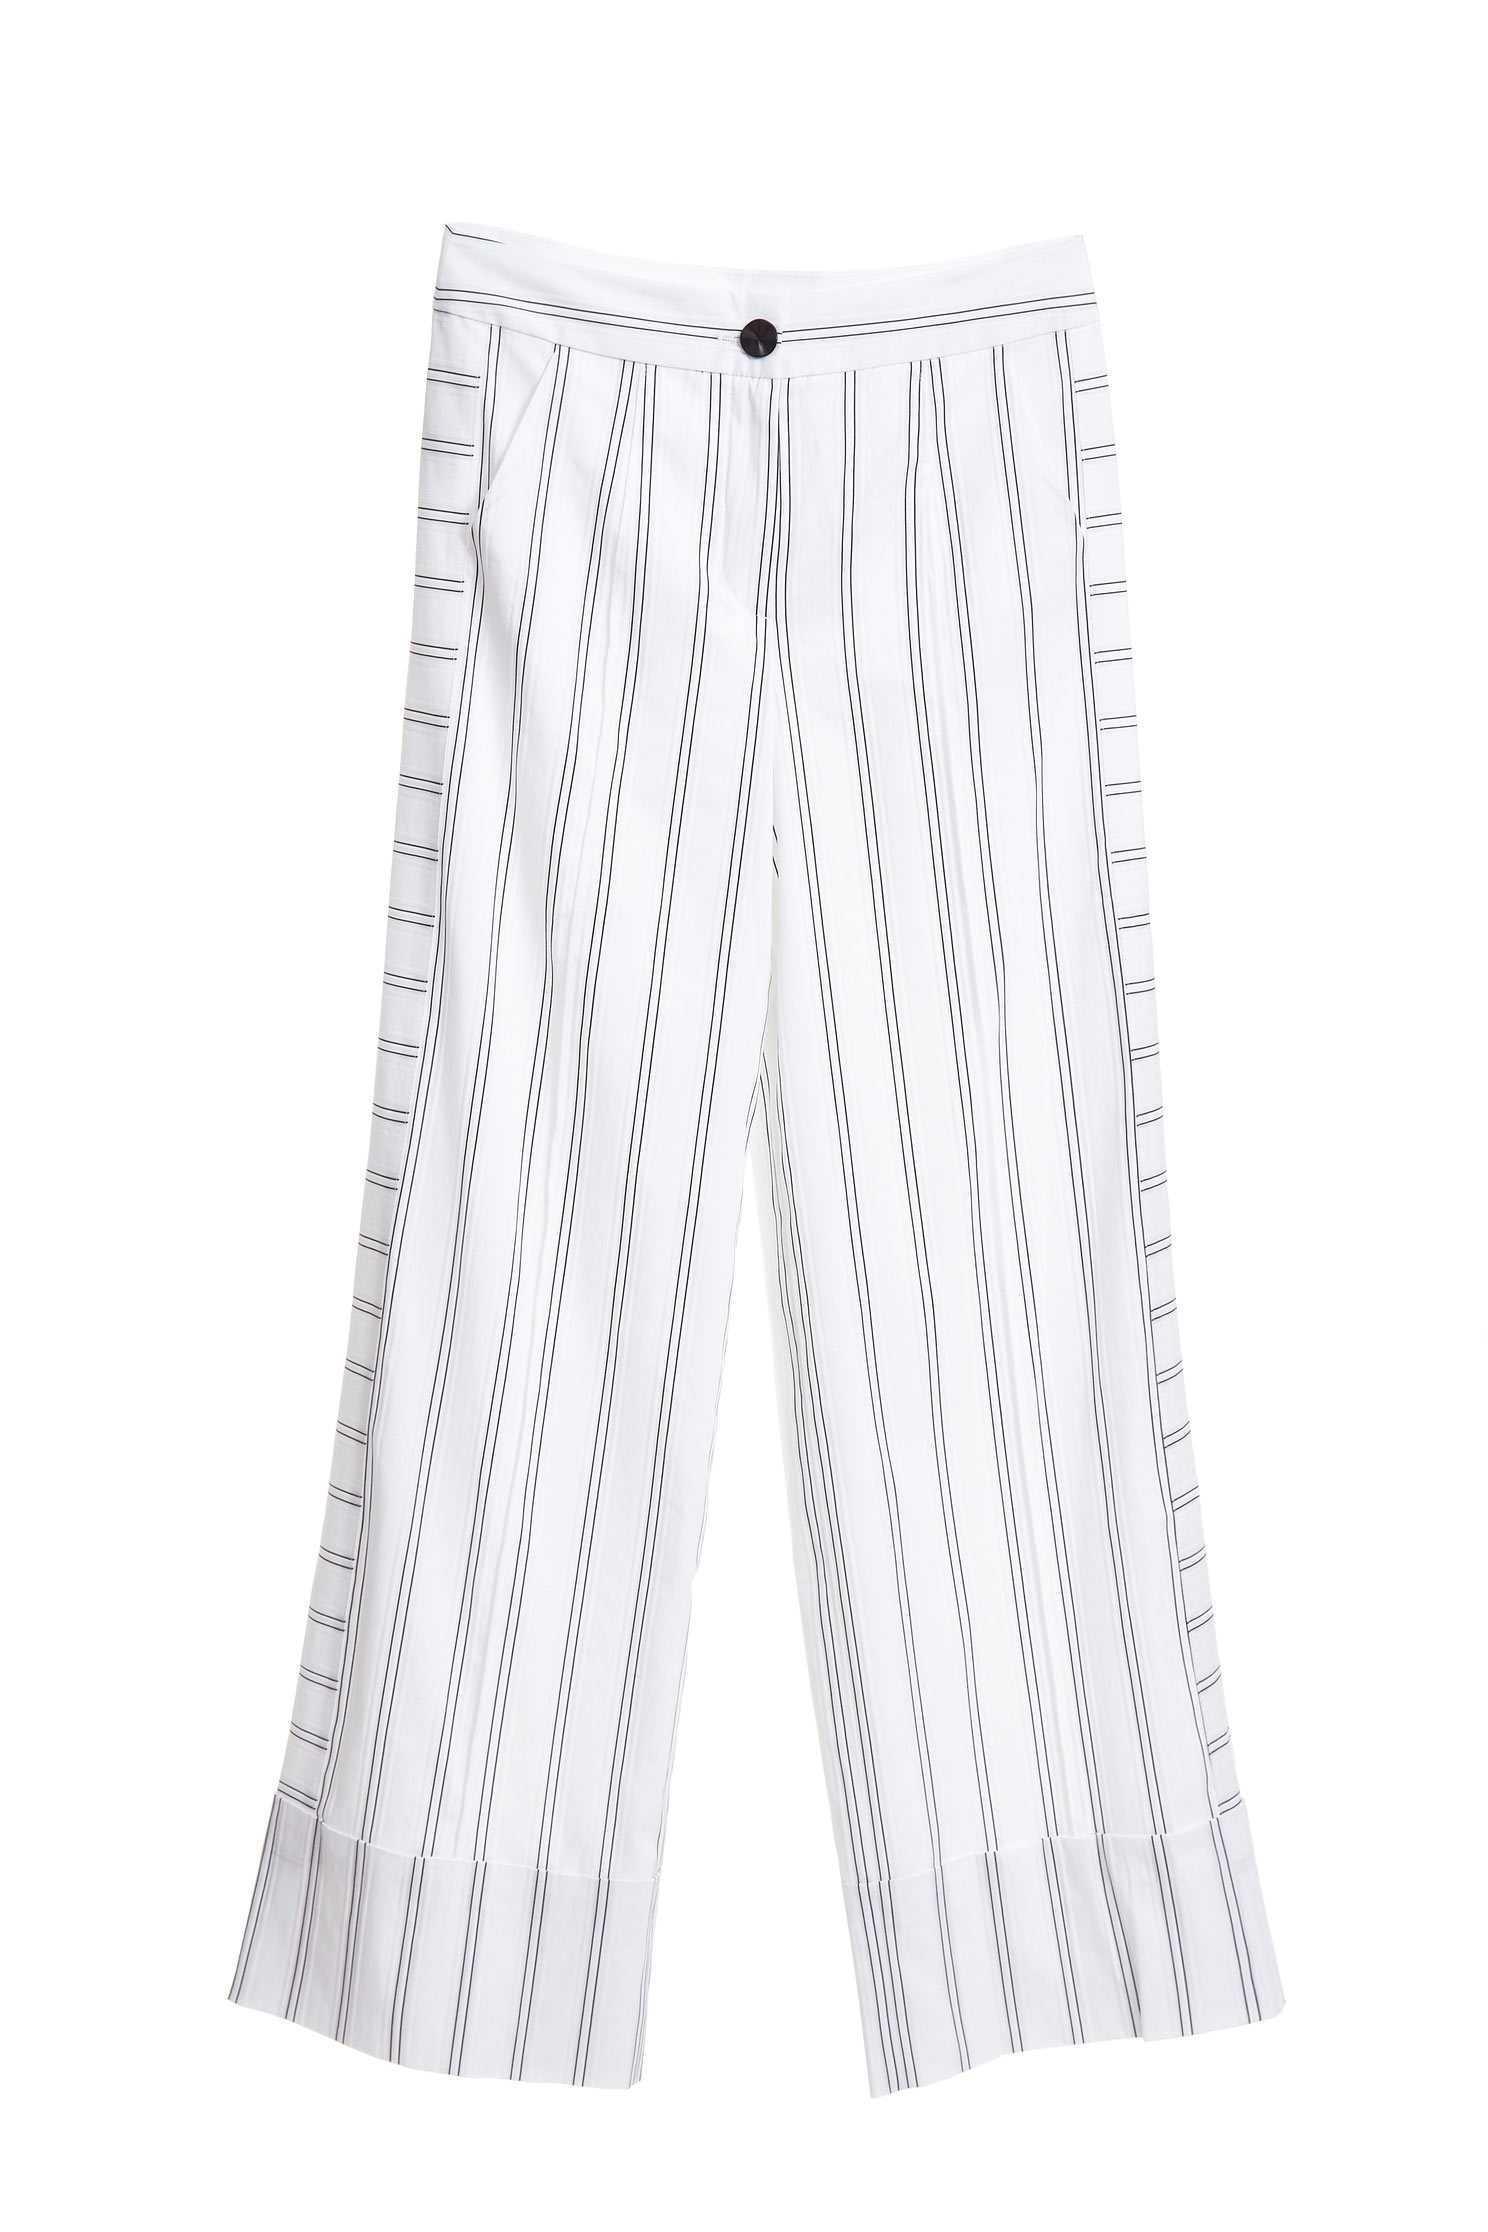 Irregular striped fashion wide-leg pants